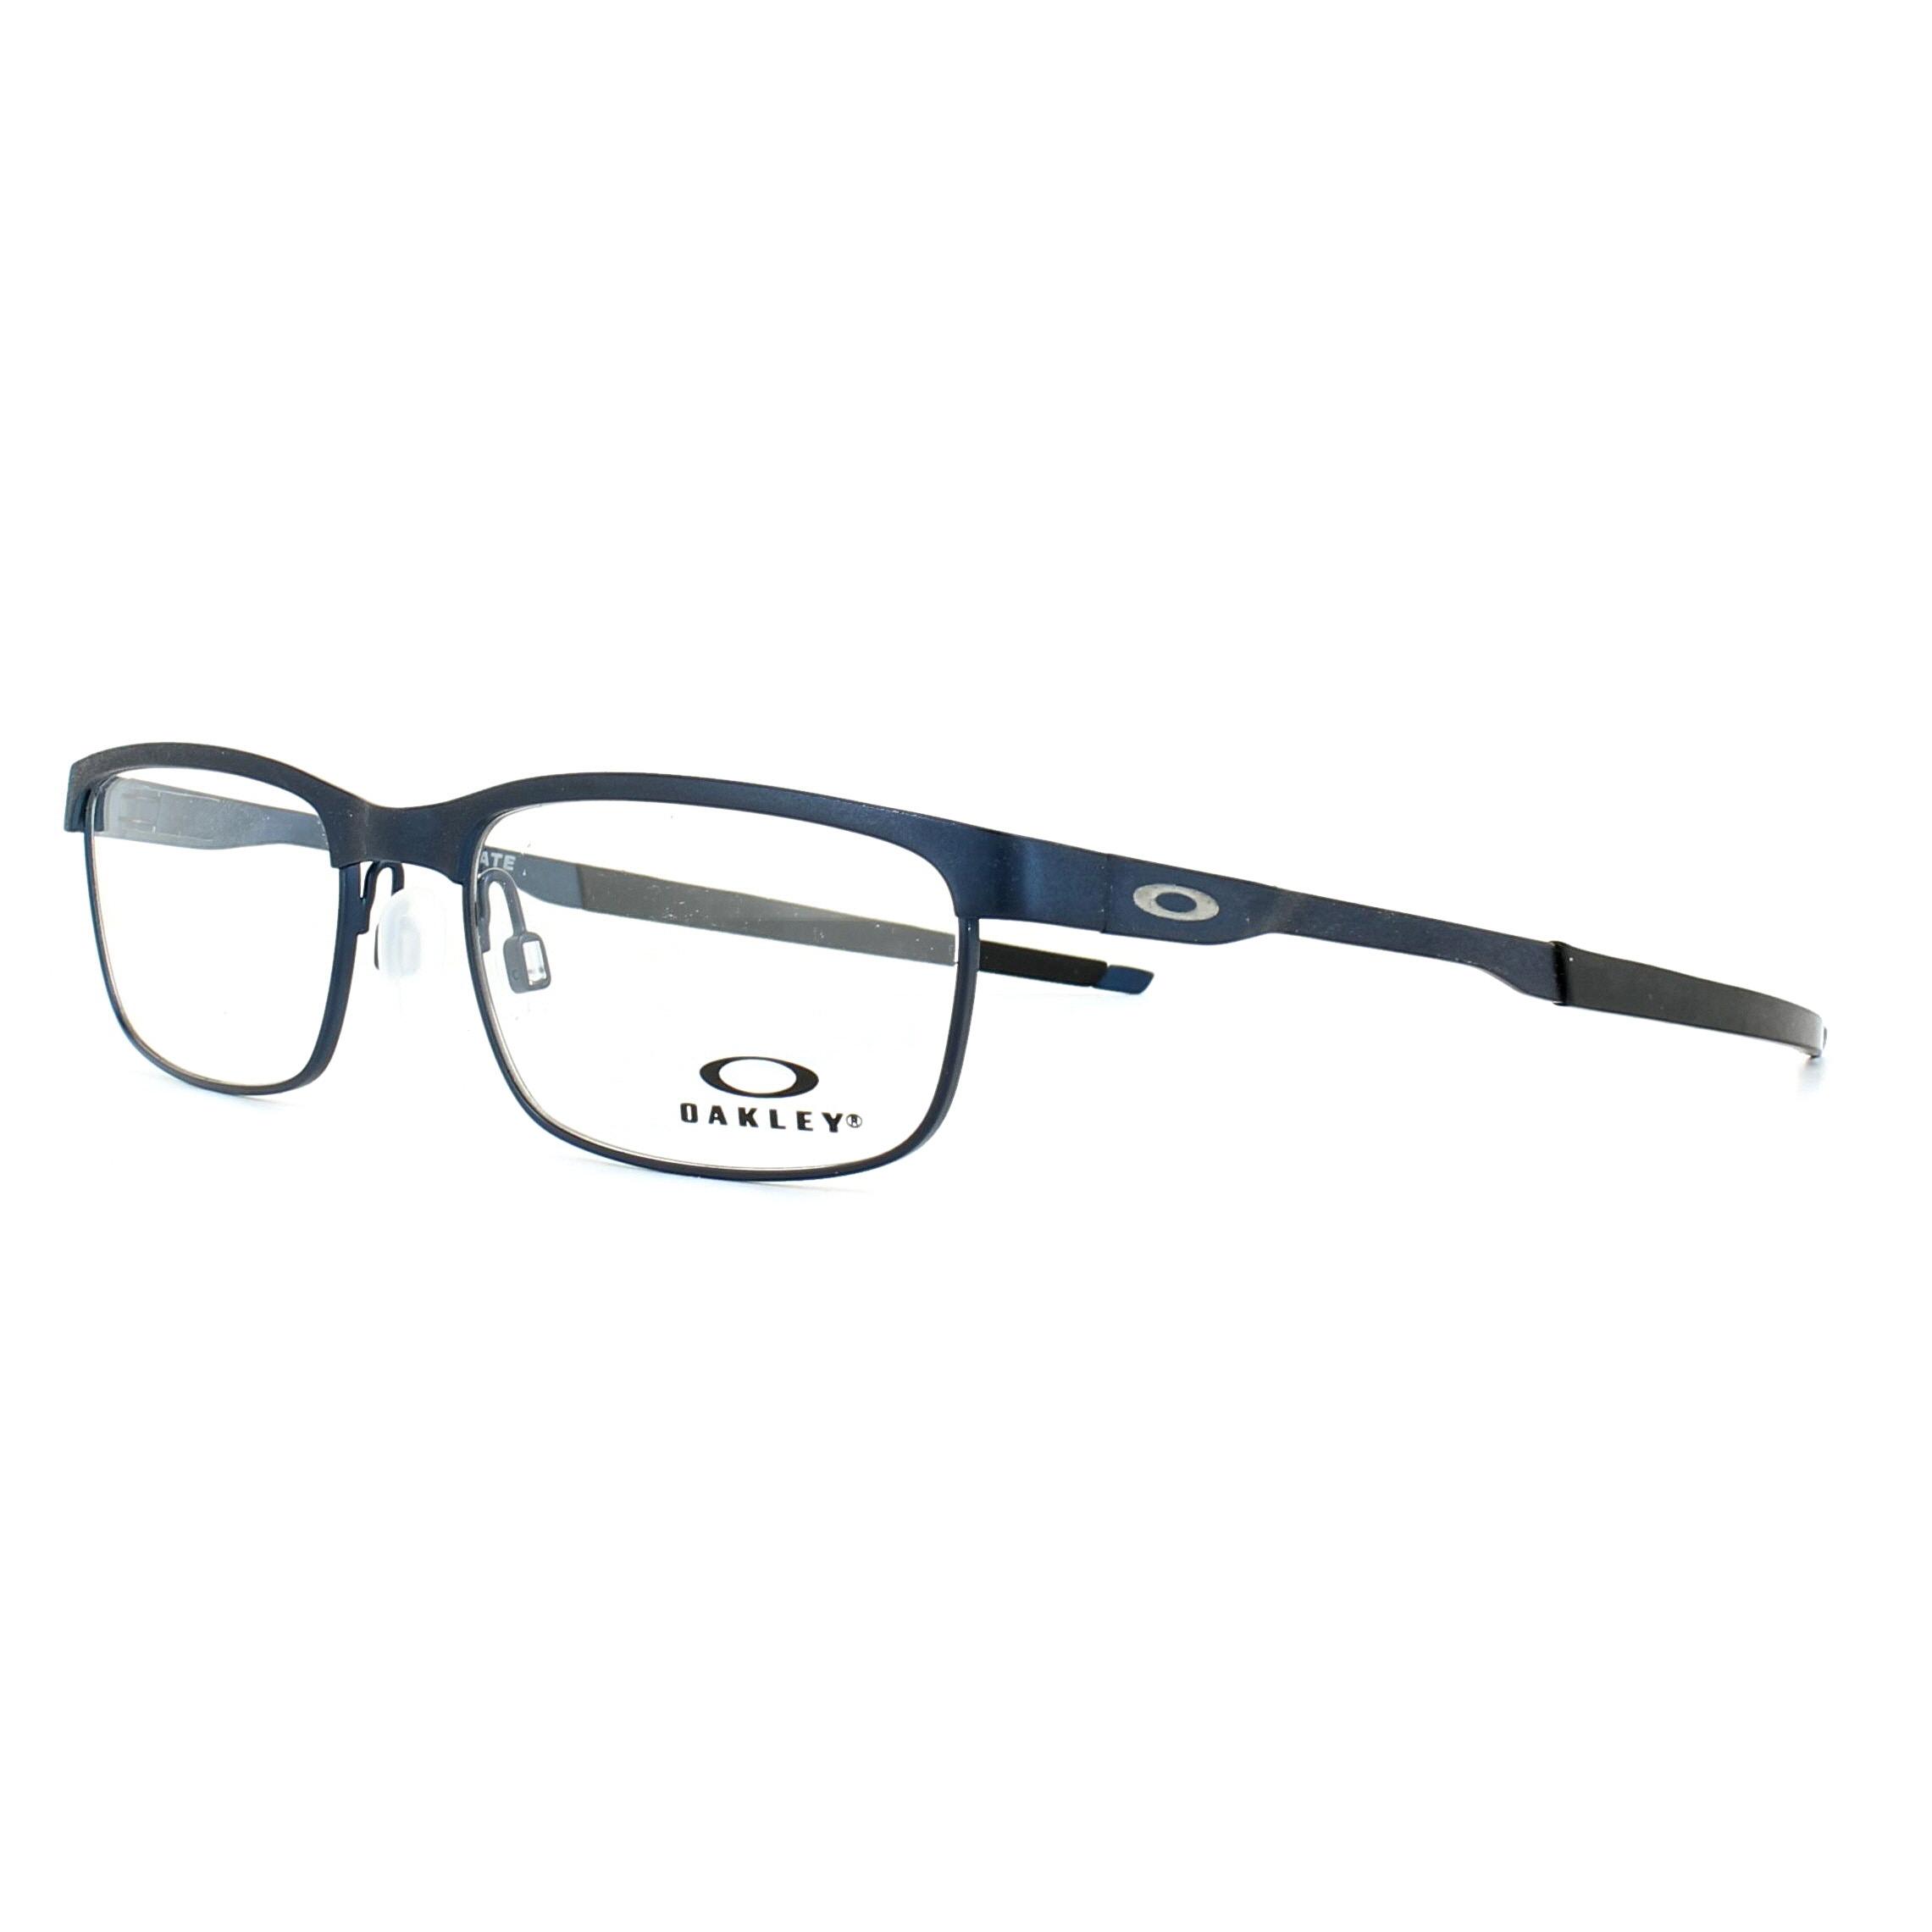 5a9205e3f6 Sentinel Oakley Glasses Frames Steel Plate OX3222-03 Powder Midnight 52mm  Mens